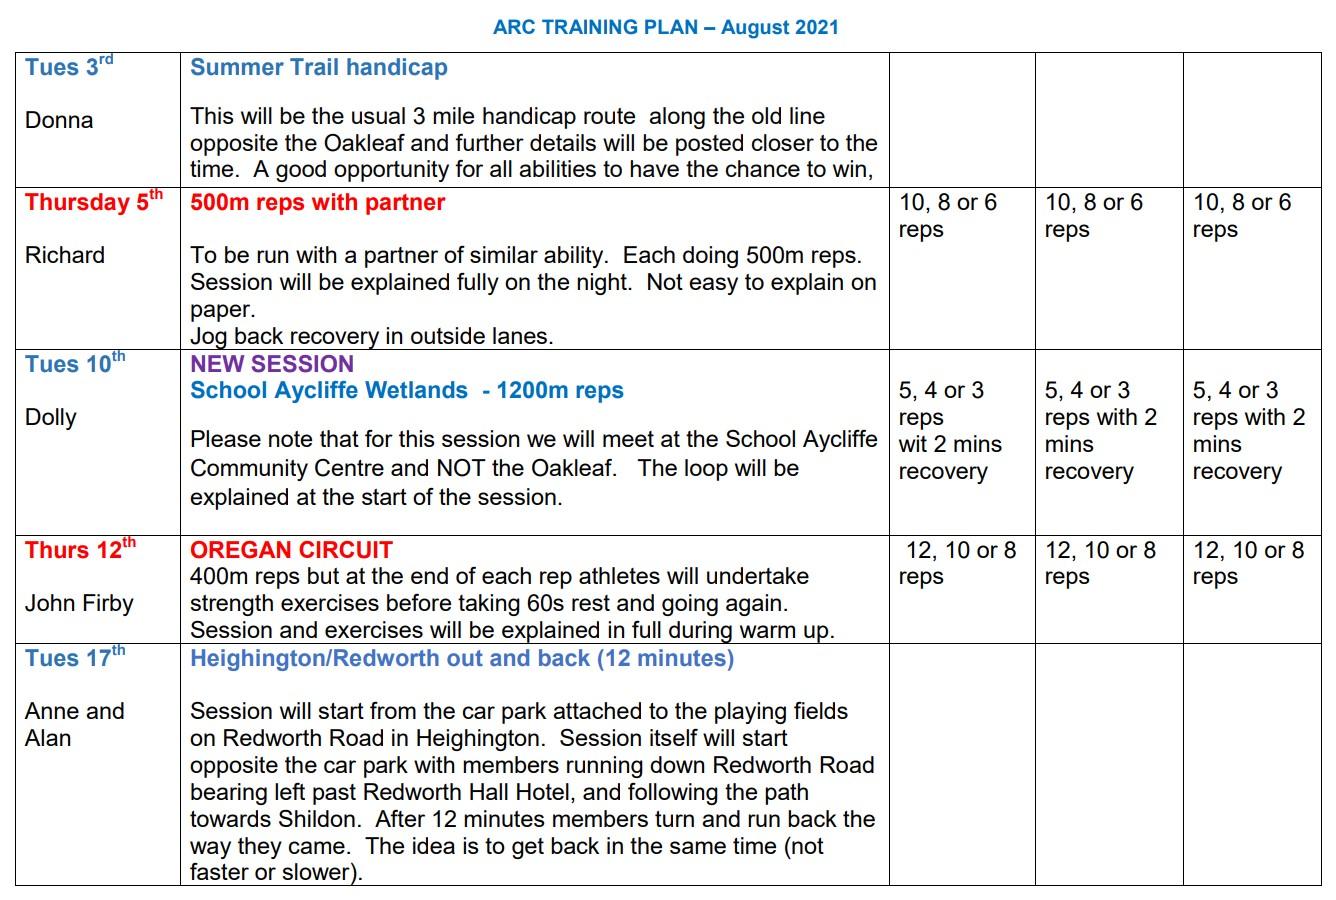 ARC Training Plan August v3 2021 a